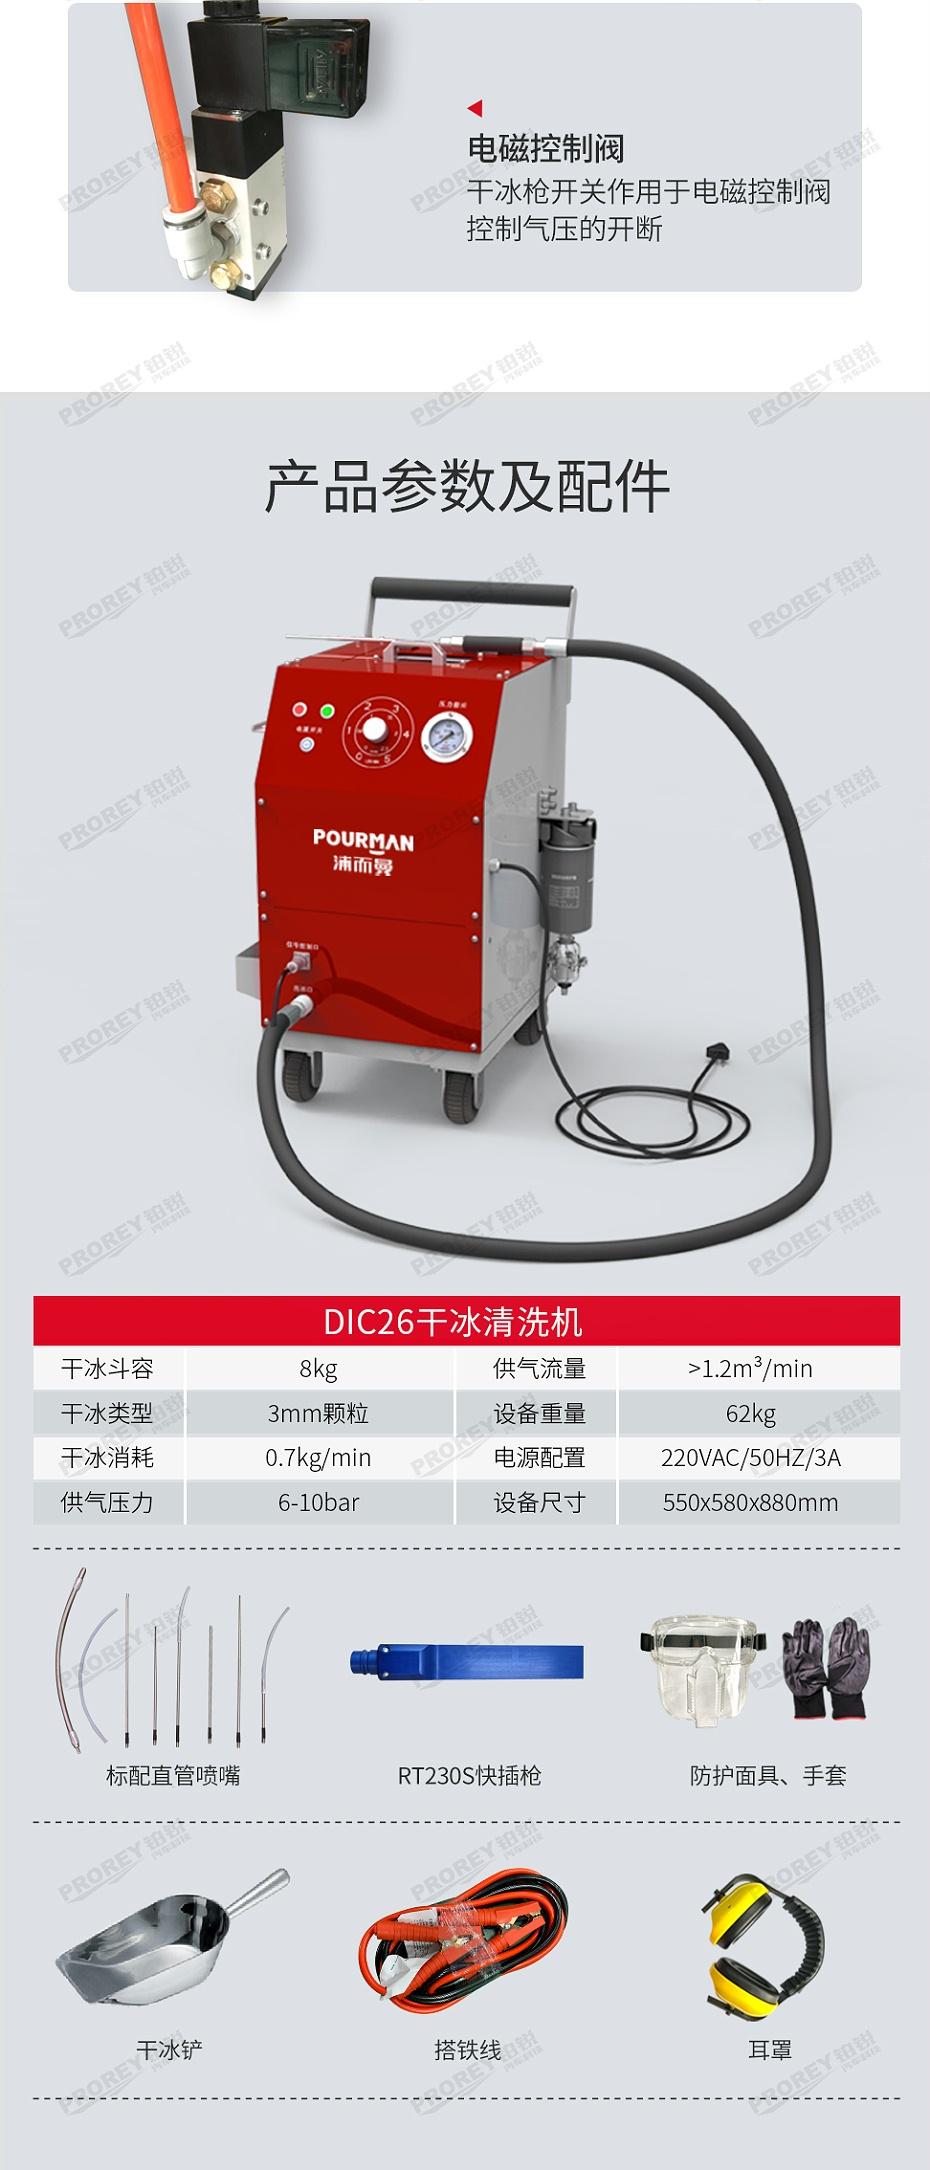 GW-130041449-浦而曼 DIC26 干冰清洗机-5